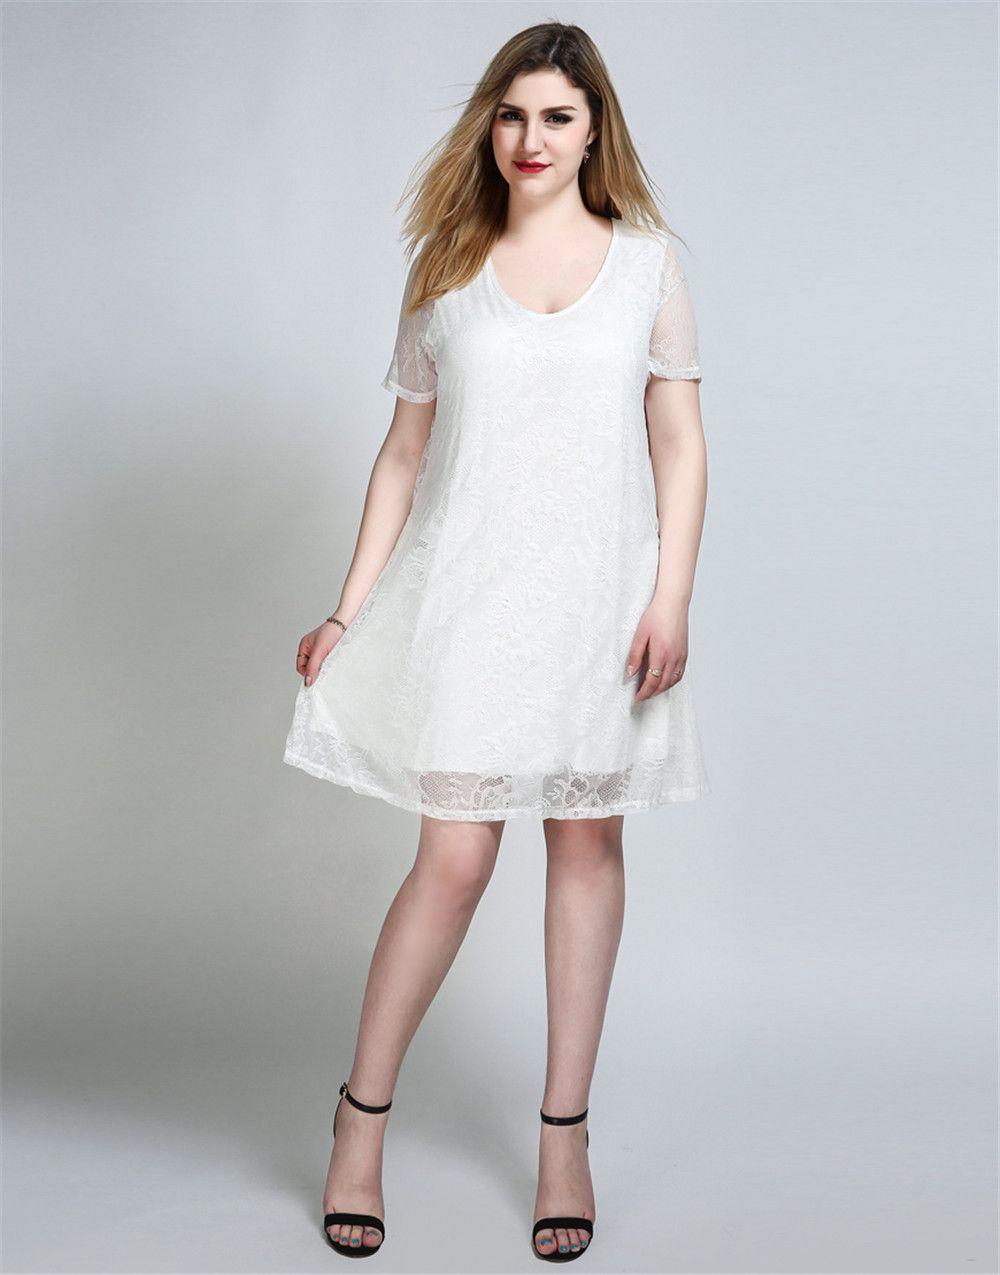 6c2bf14c07c7f [38% OFF] Cute Ann Women's Sexy V-neck Short Sleeve Plus Size Lace Swing  Dress | Rosegal